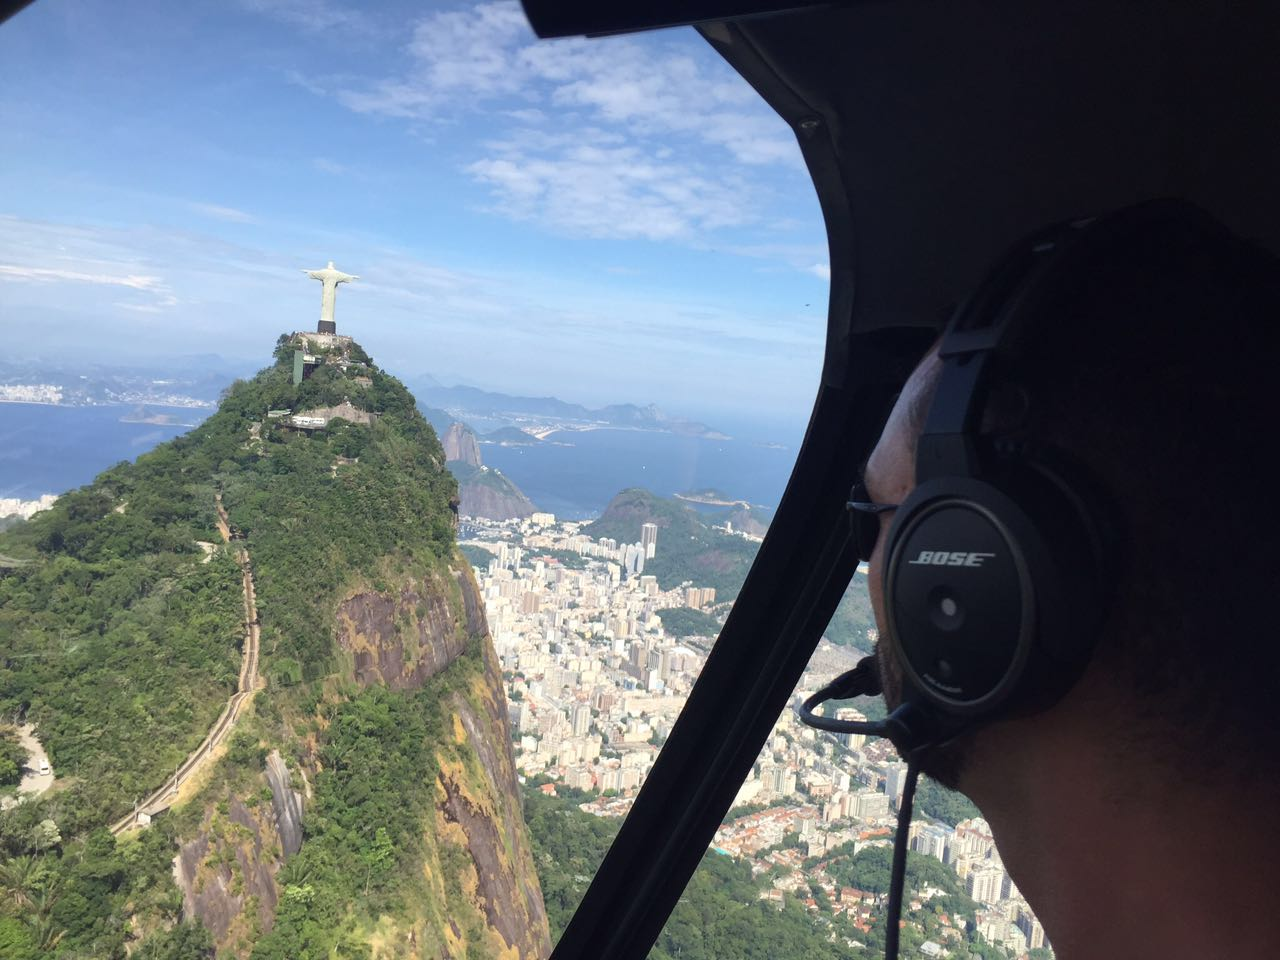 Passeio de helicóptero no Rio.